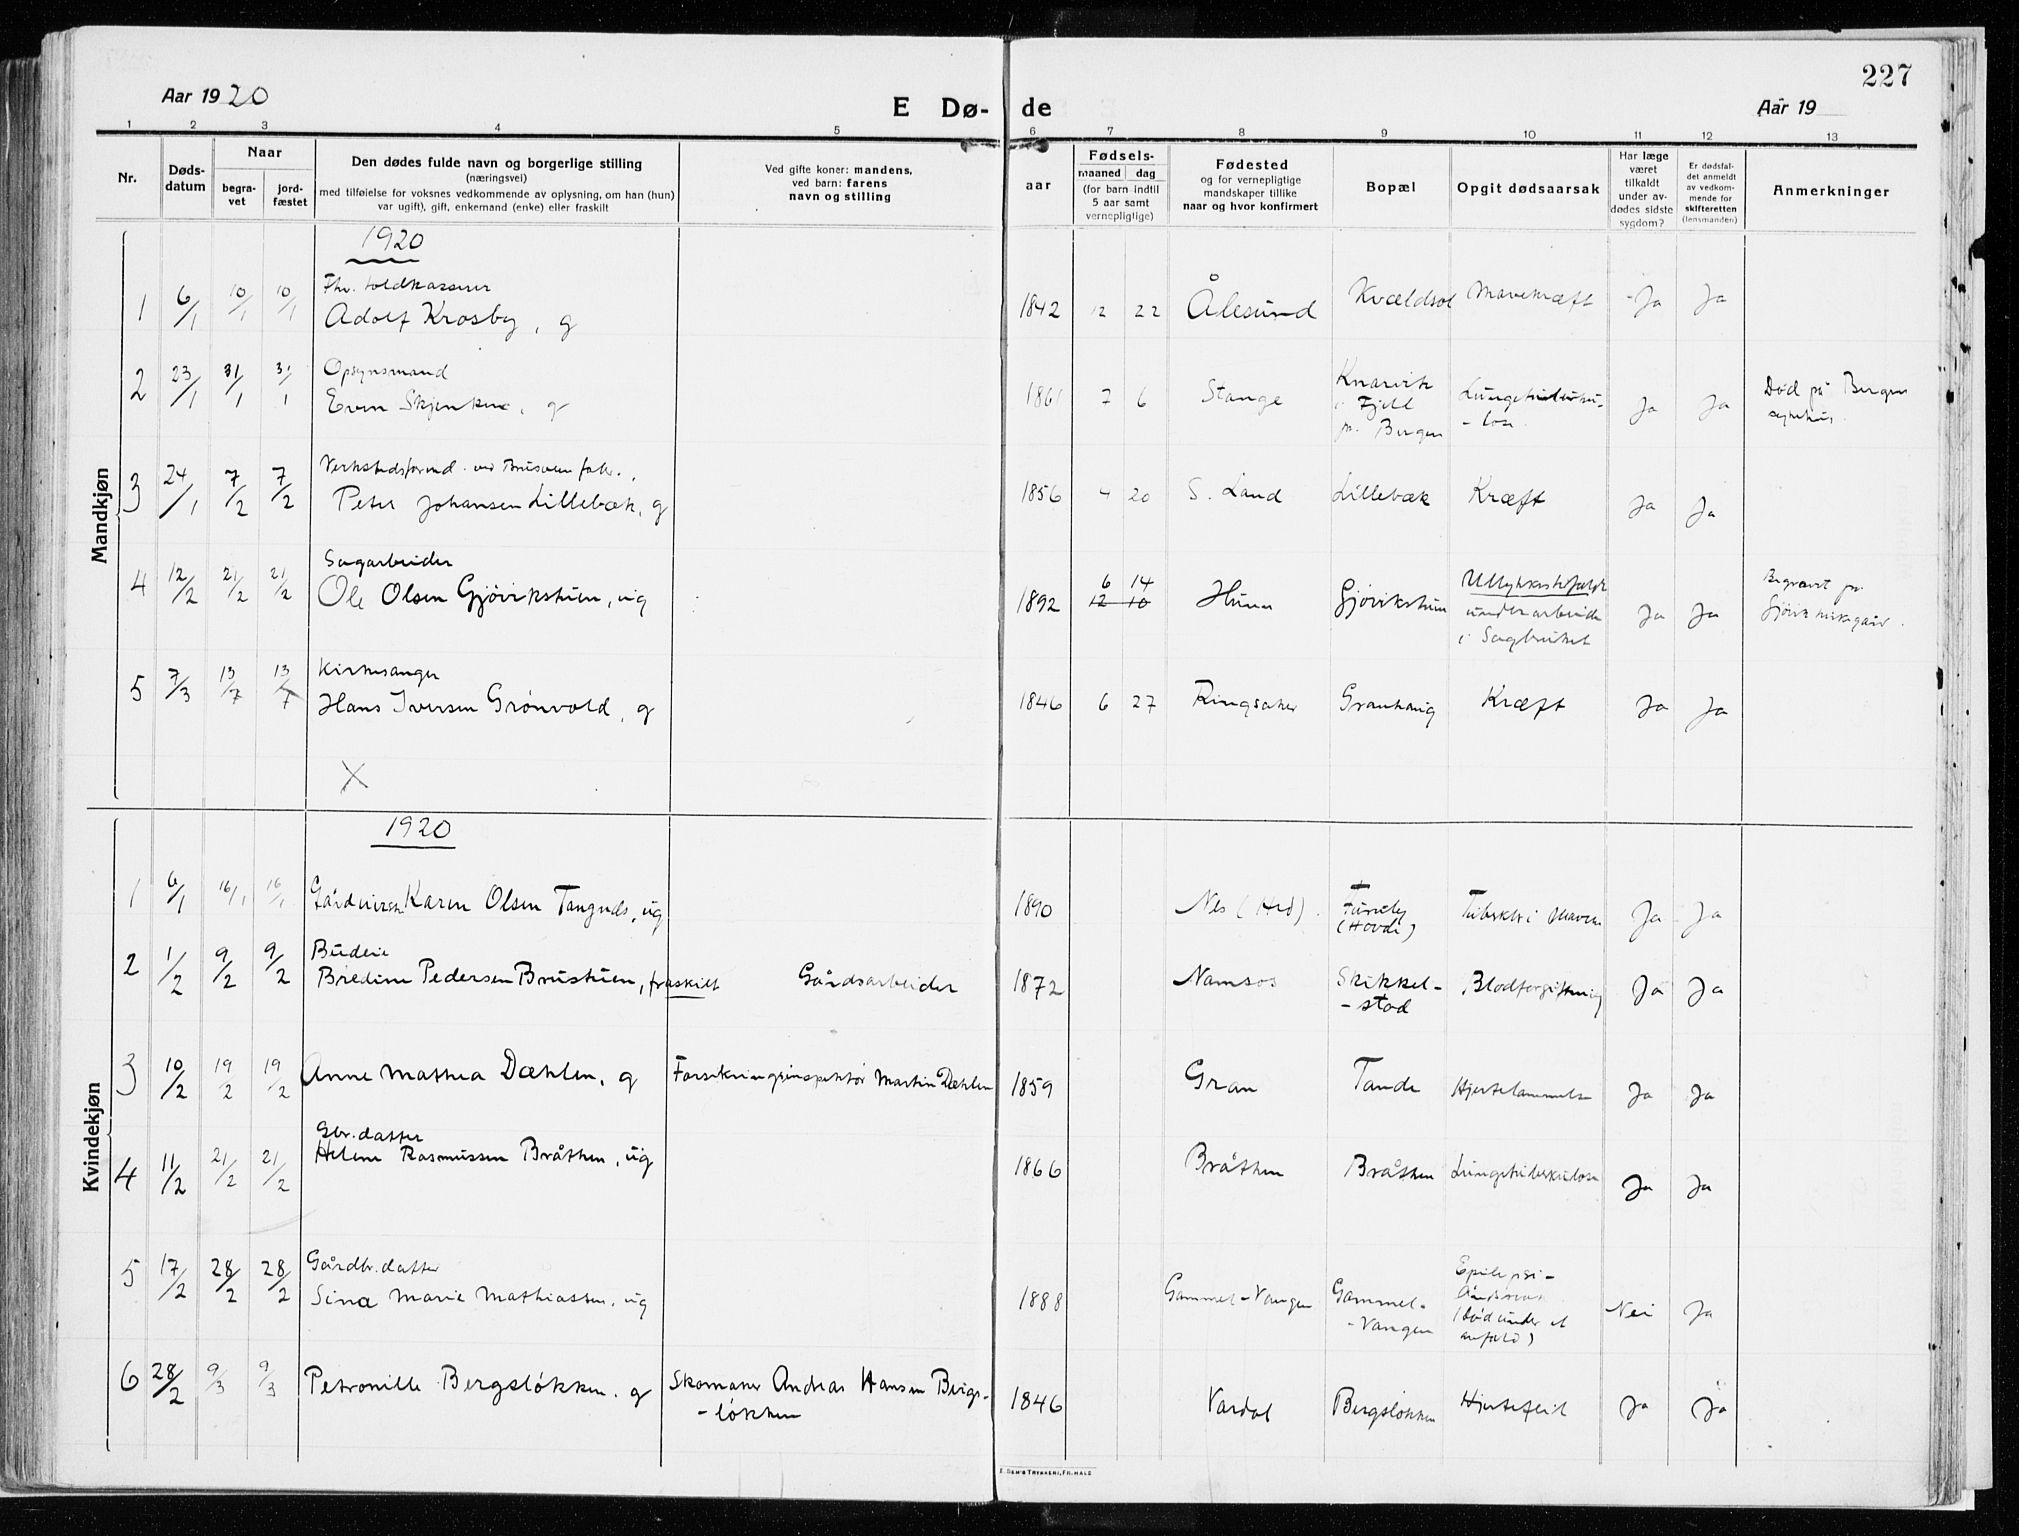 SAH, Vardal prestekontor, H/Ha/Haa/L0017: Ministerialbok nr. 17, 1915-1929, s. 227